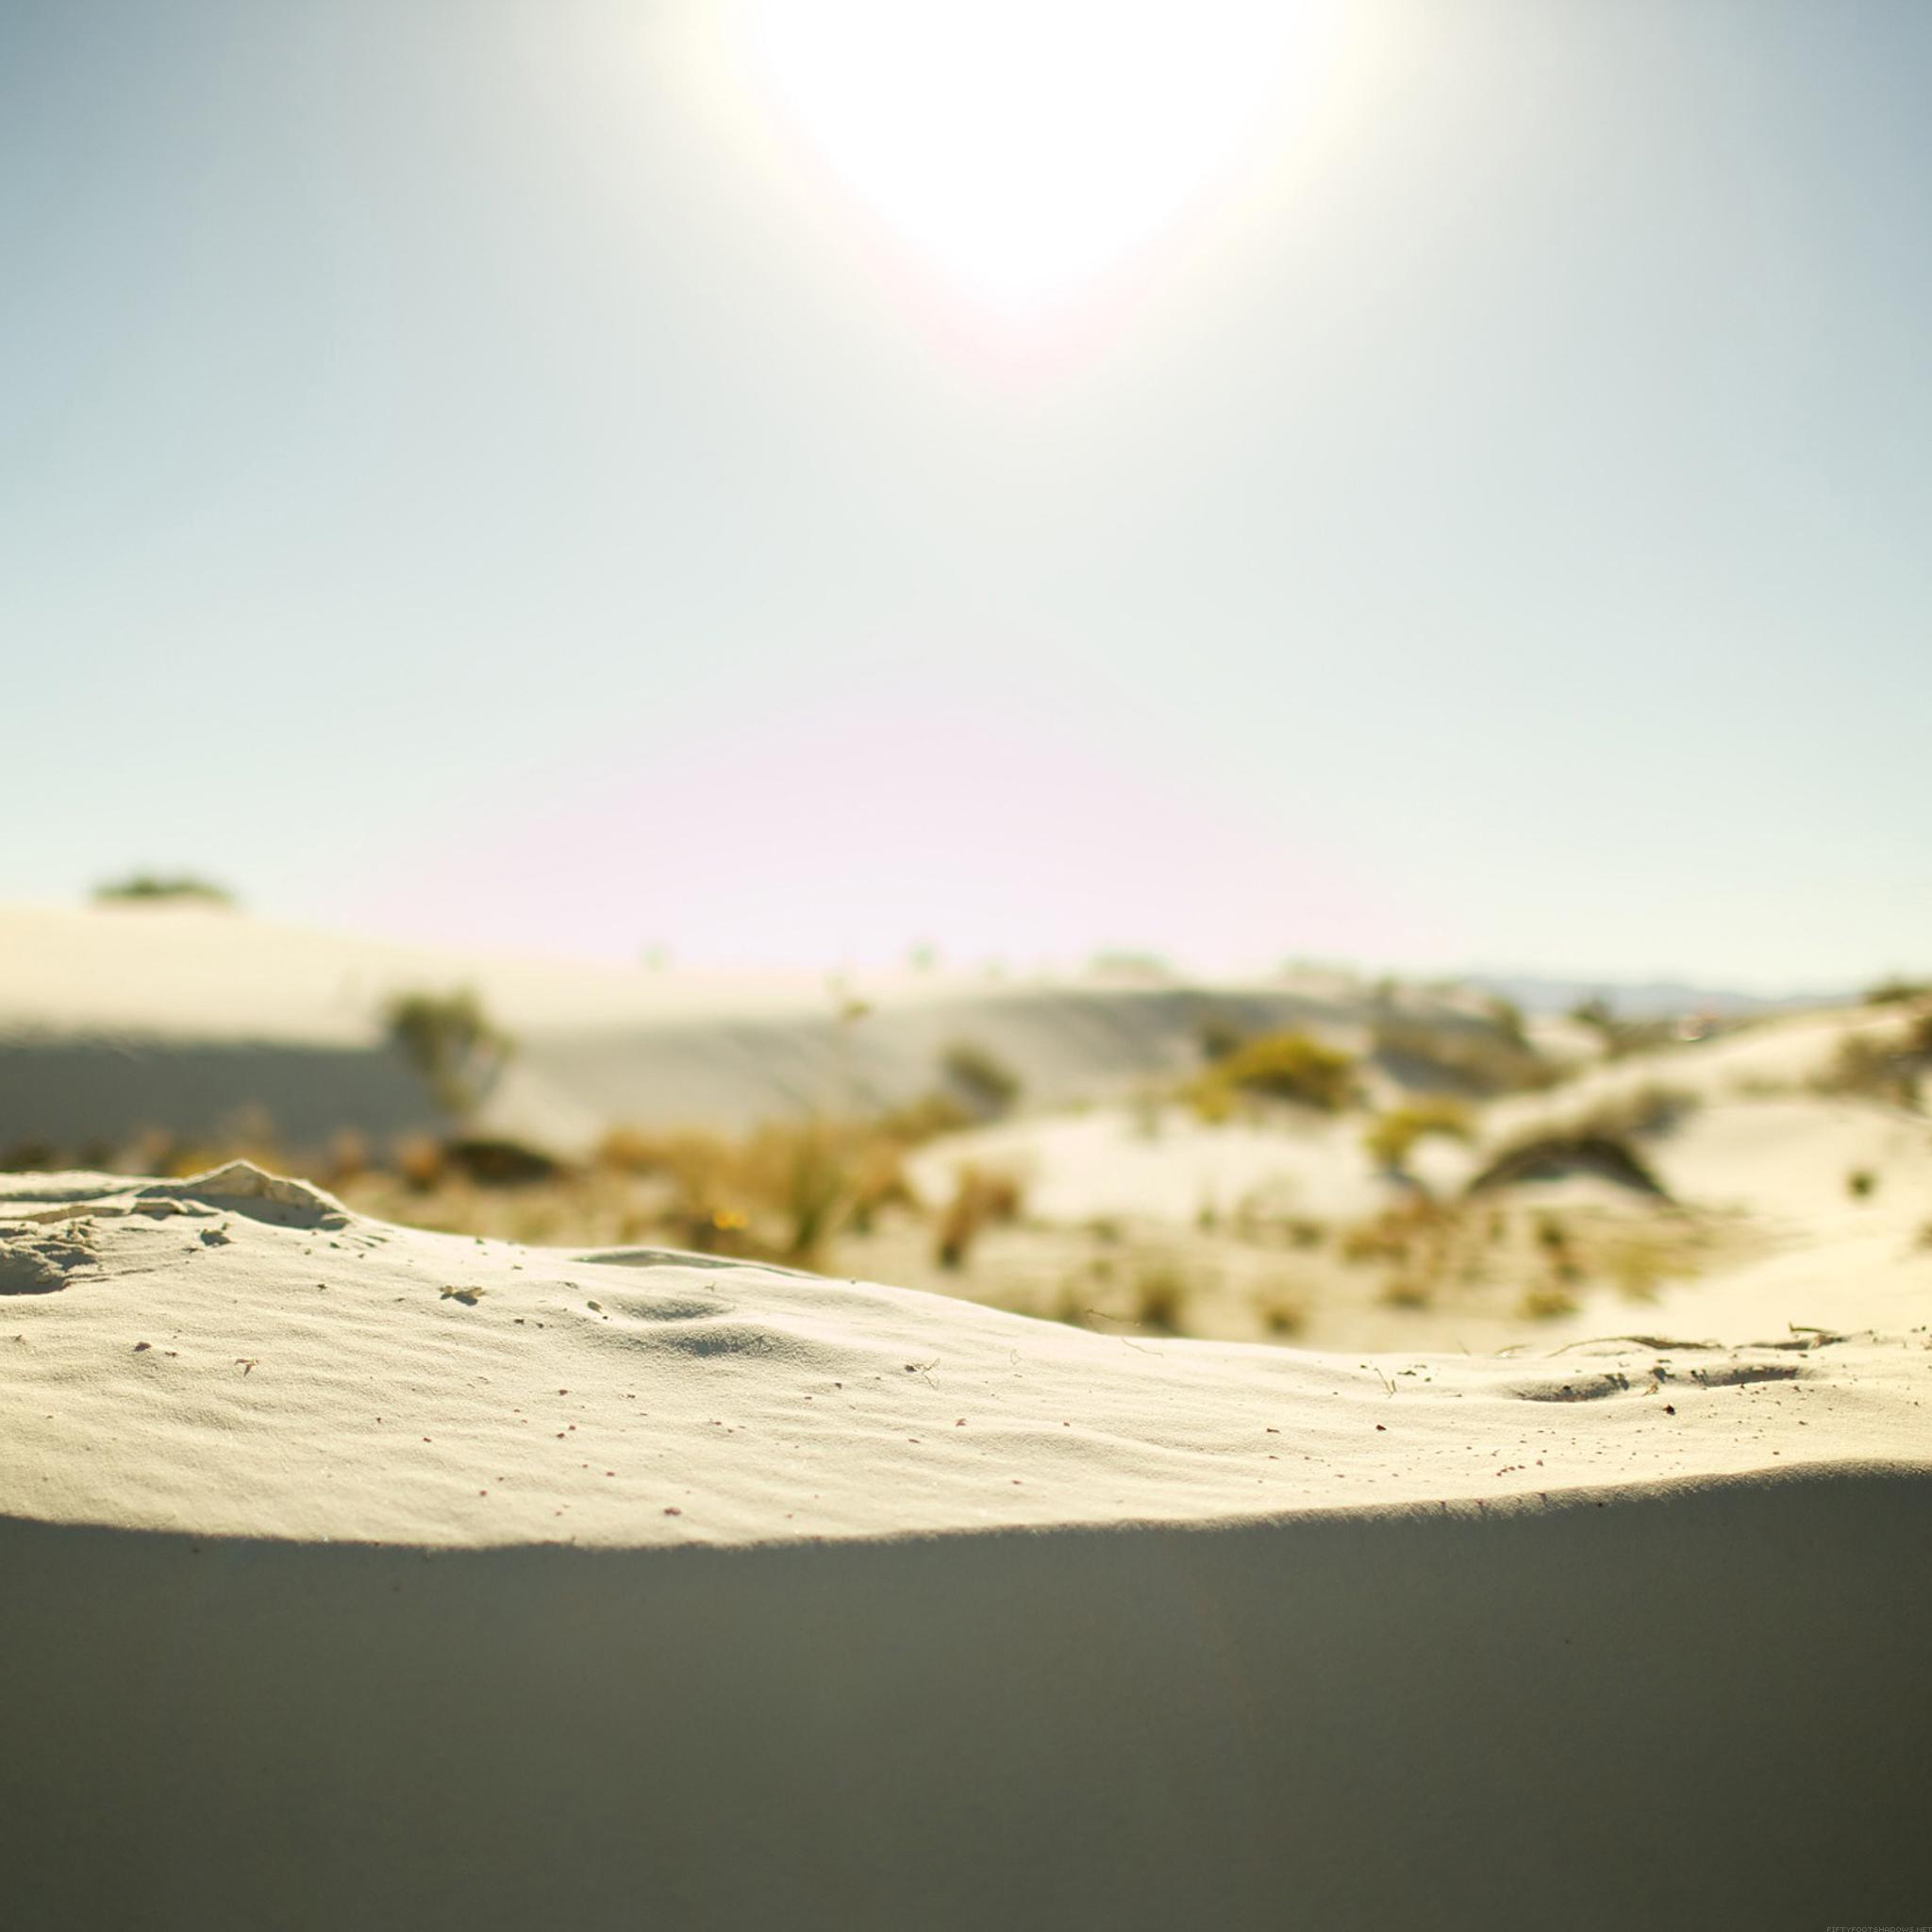 Sand-Dunes-3Wallpapers-iPad-Retina